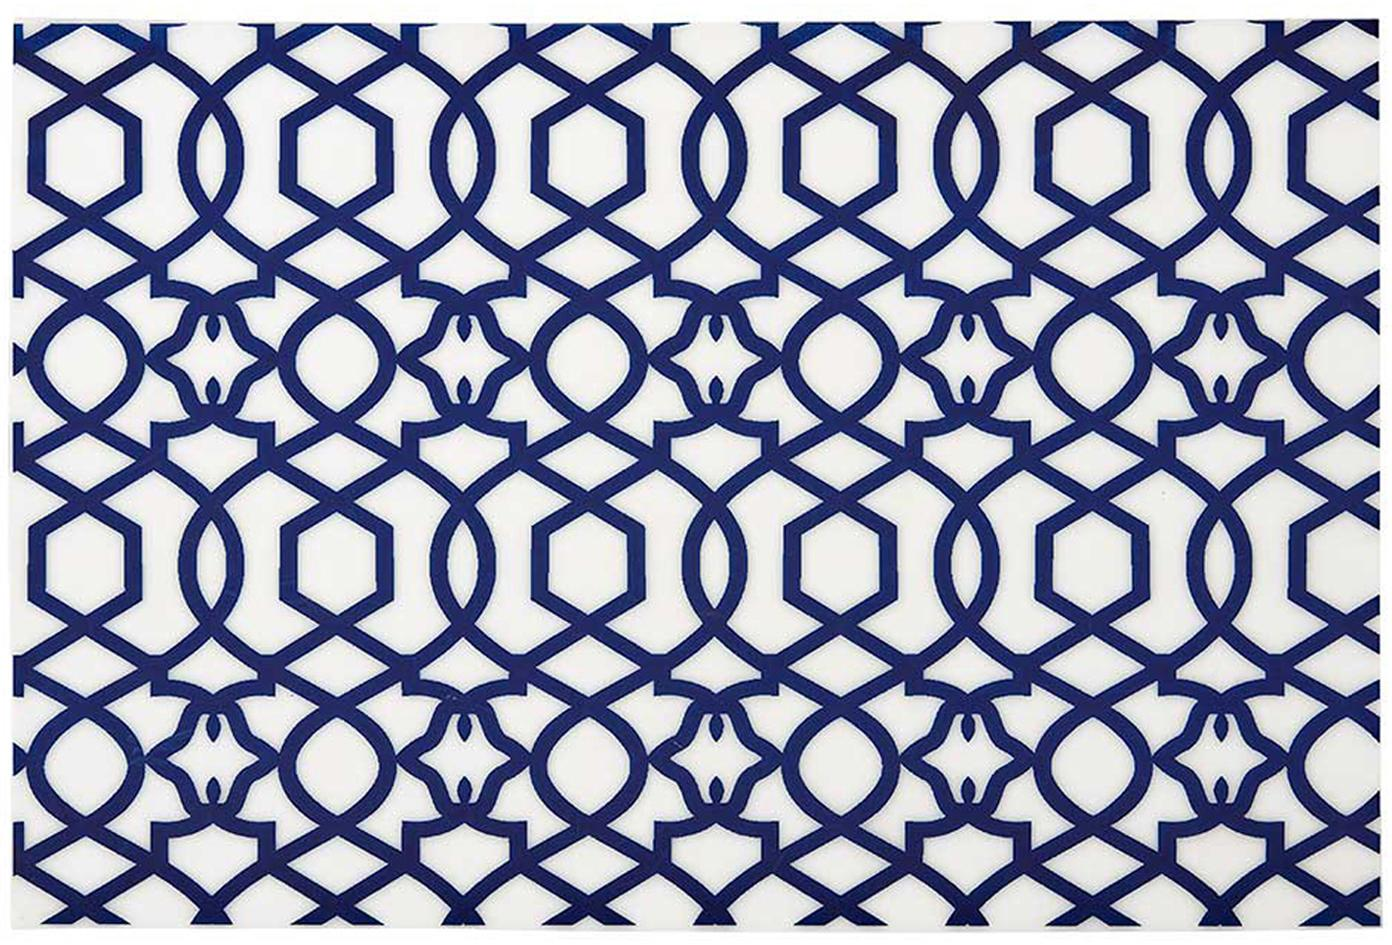 Kunststoff-Tischsets Tropic, 4 Stück, Kunststoff (PVC), Dunkelblau, 30 x 45 cm